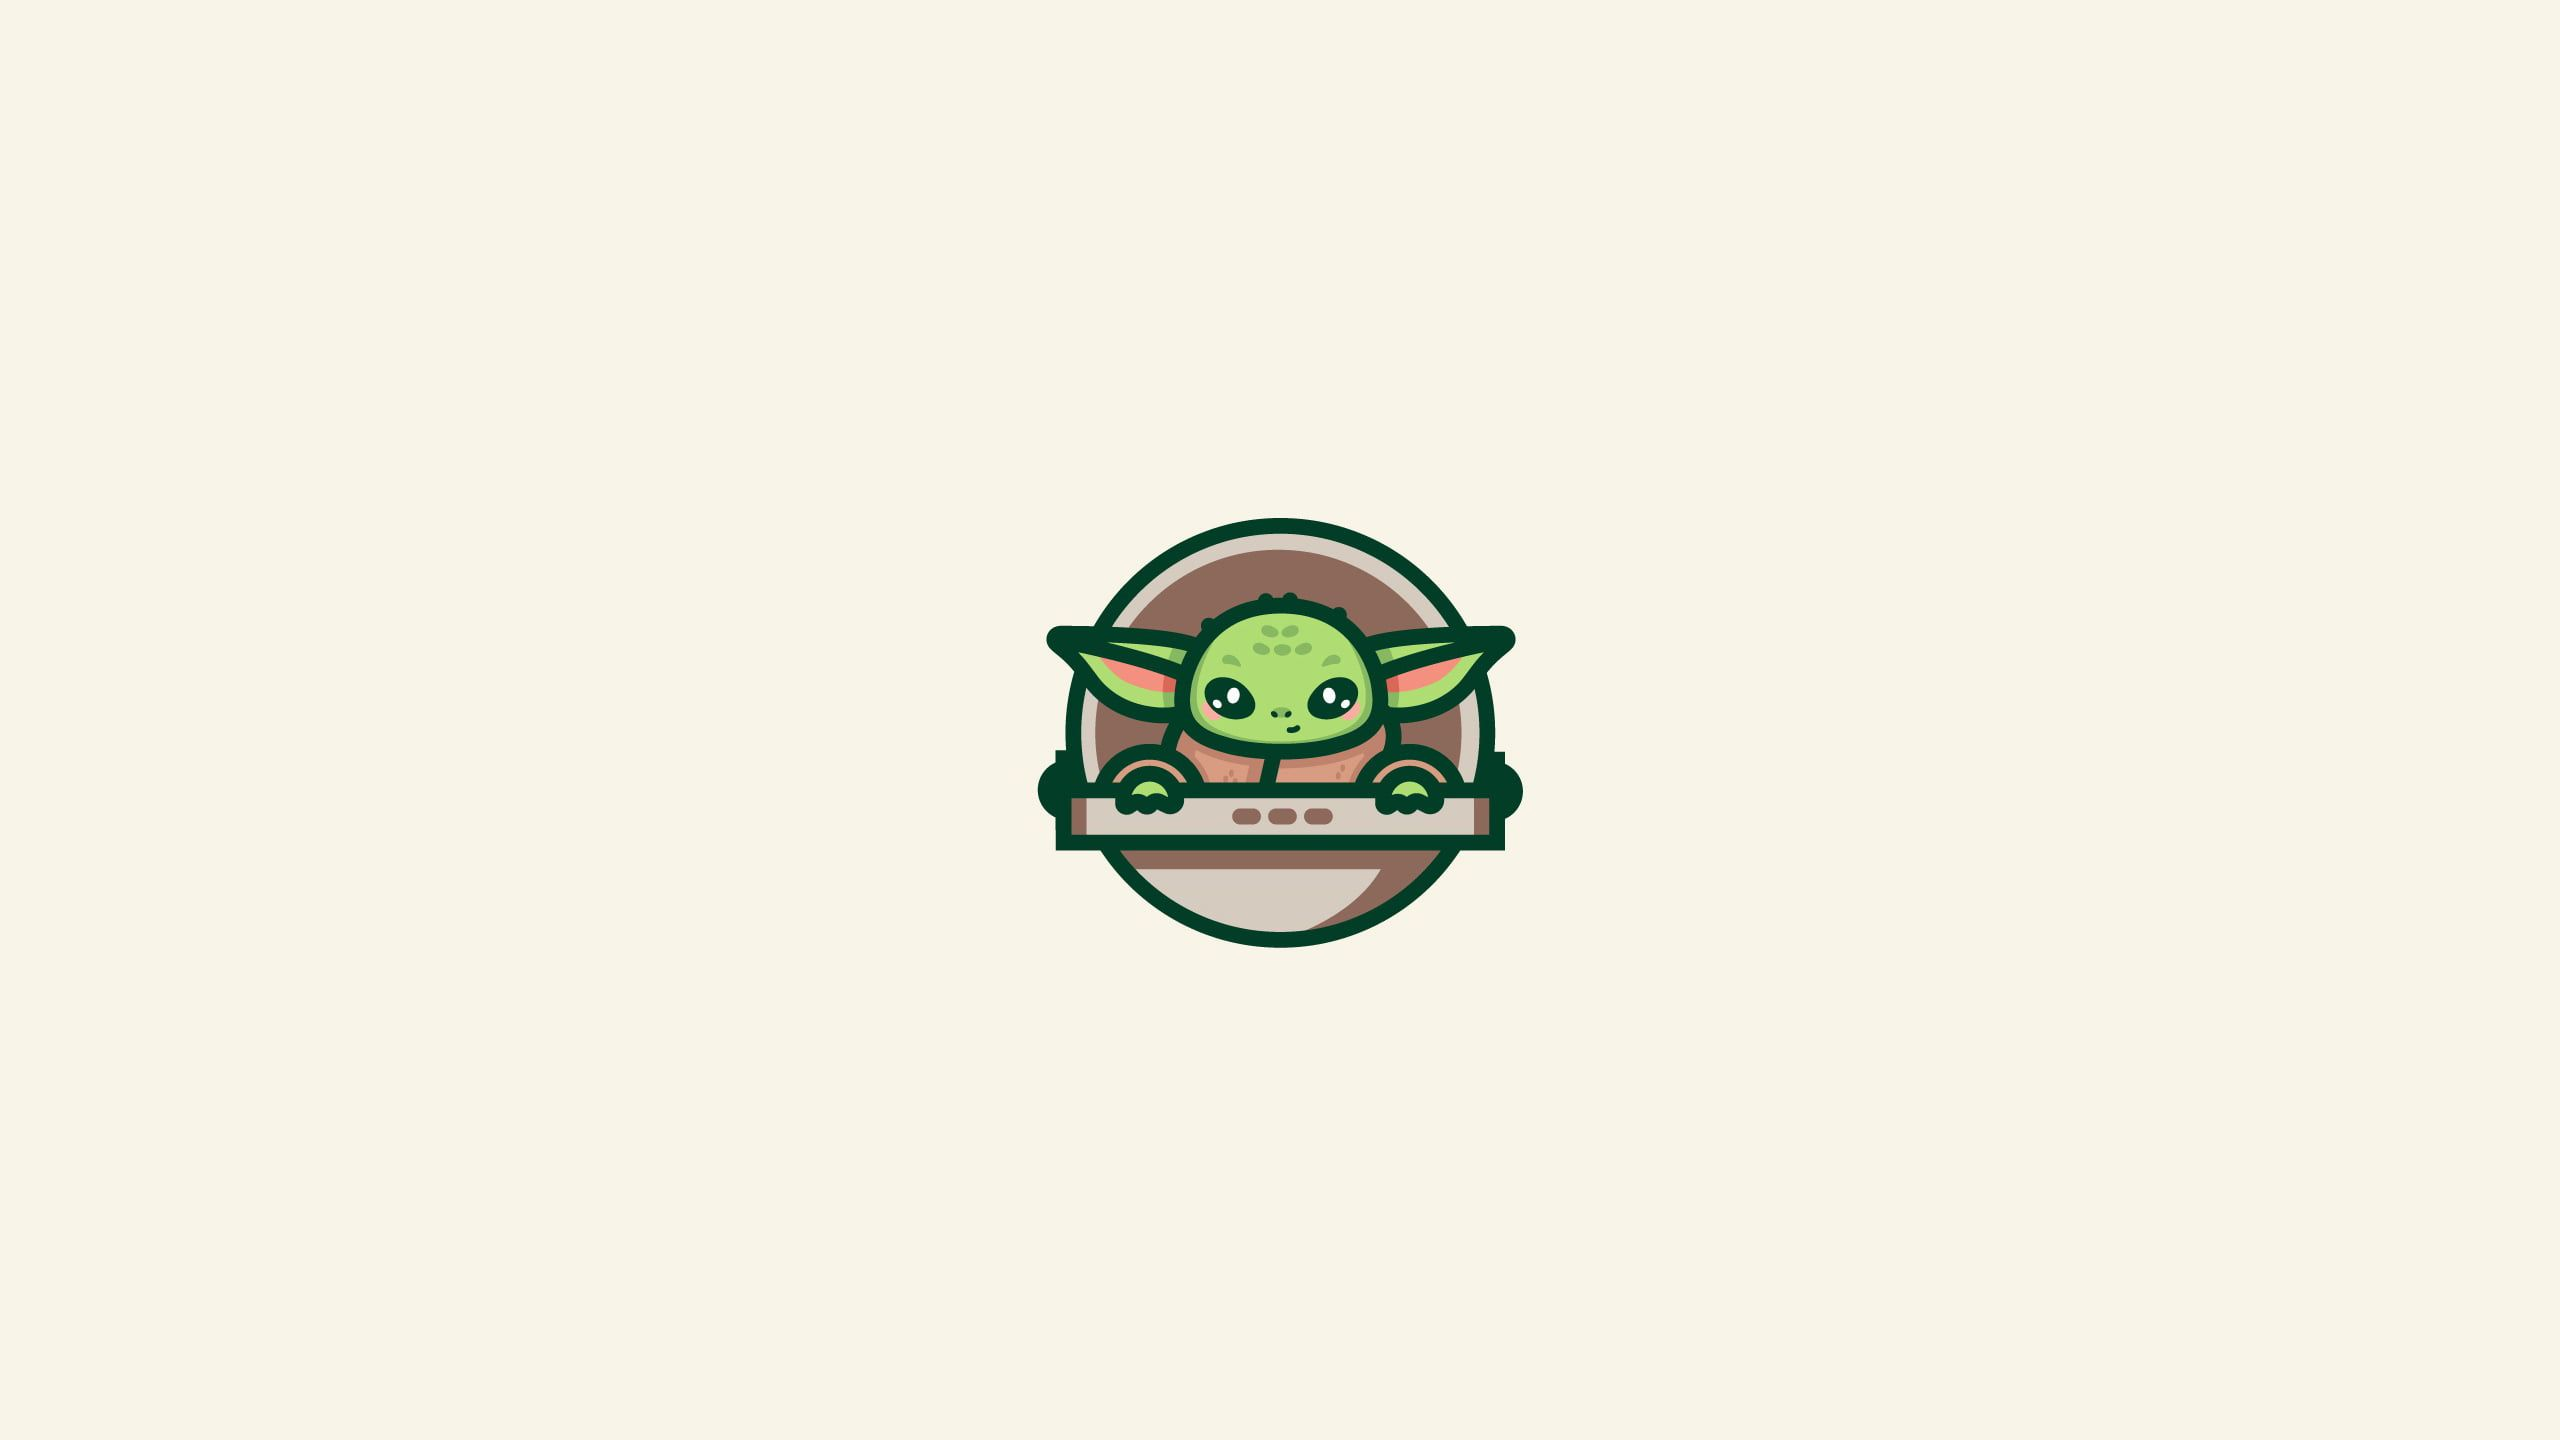 Yoda Baby Yoda Star Wars Illustration Digital 2k Wallpaper Hdwallpaper Desktop In 2020 Yoda Wallpaper Star Wars Yoda Star Wars Illustration